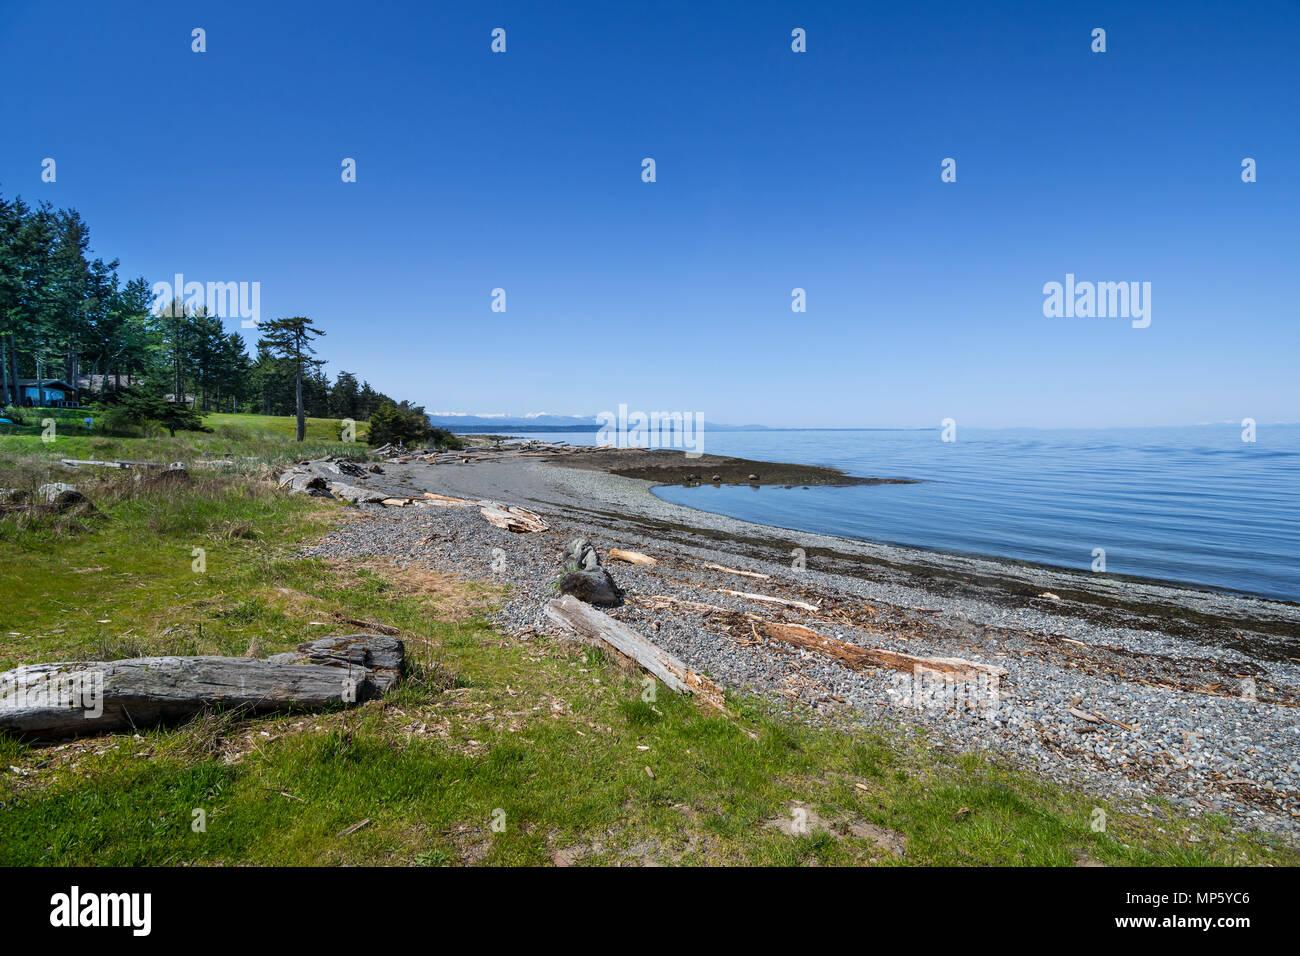 Shoreline, Hornby Island, BC, Canada. - Stock Image